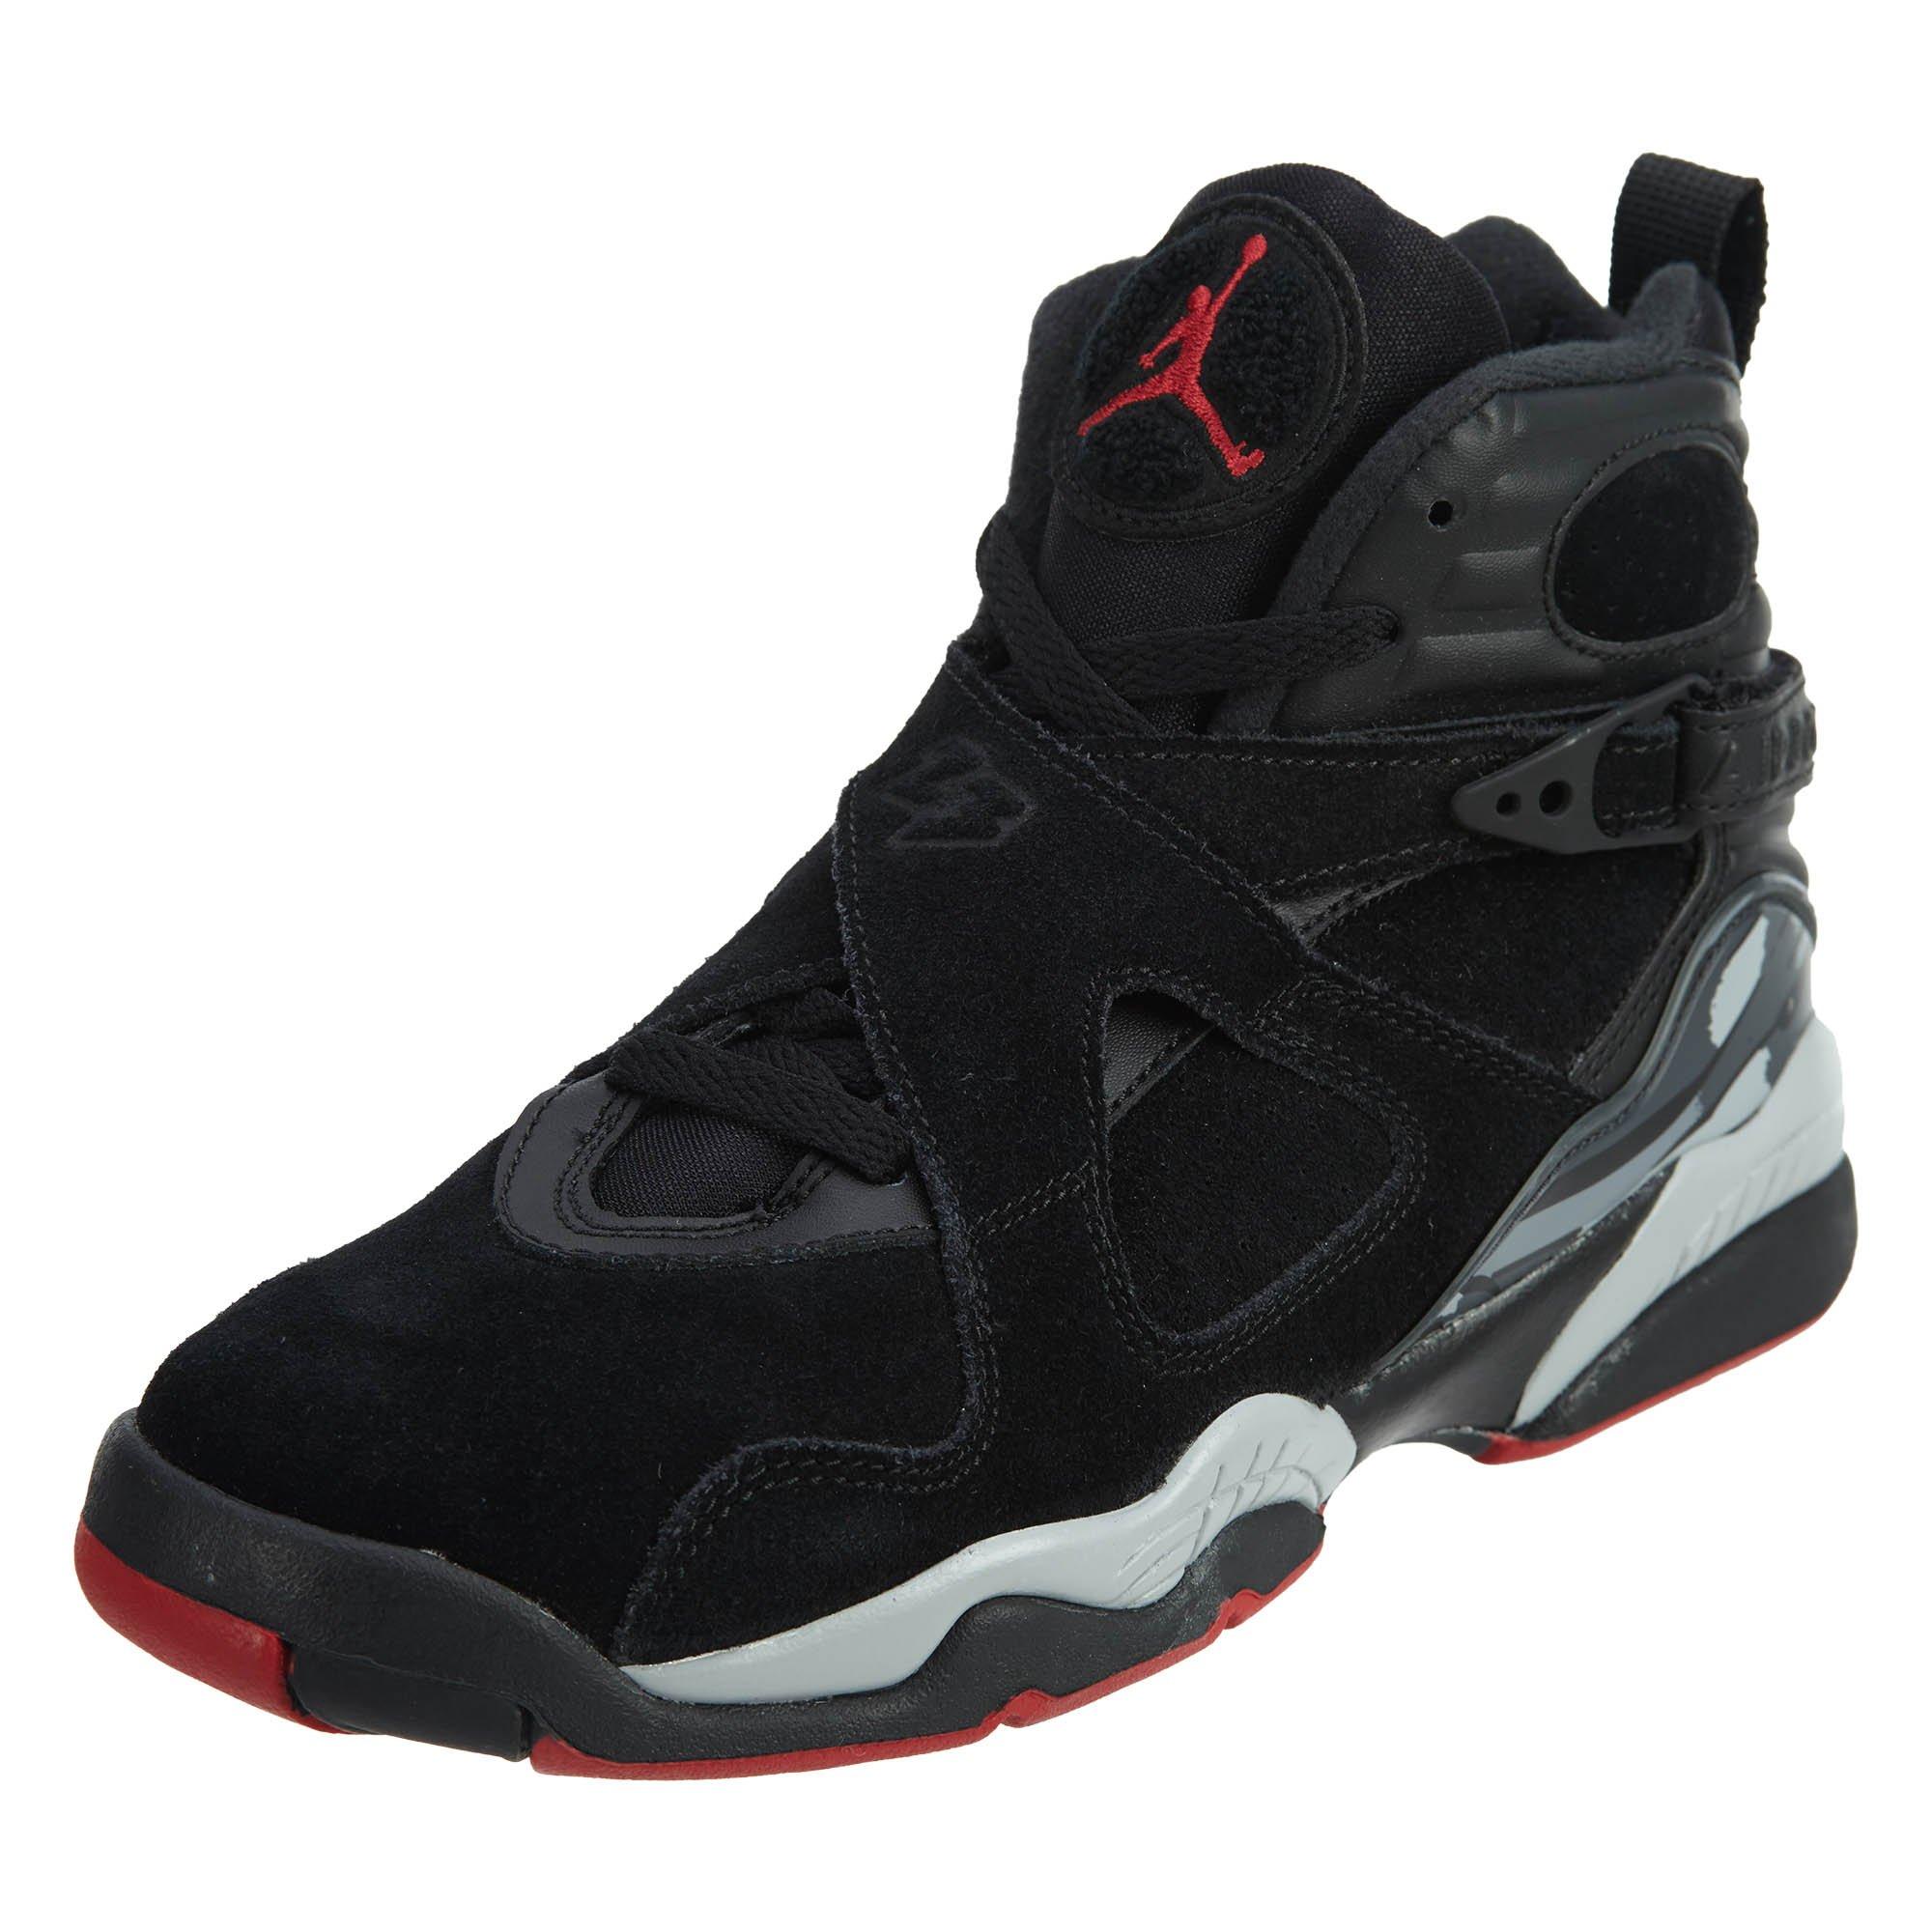 Jordan 8 Retro Big Kids Style : 305368-022 Size : 4.5 M US by Jordan